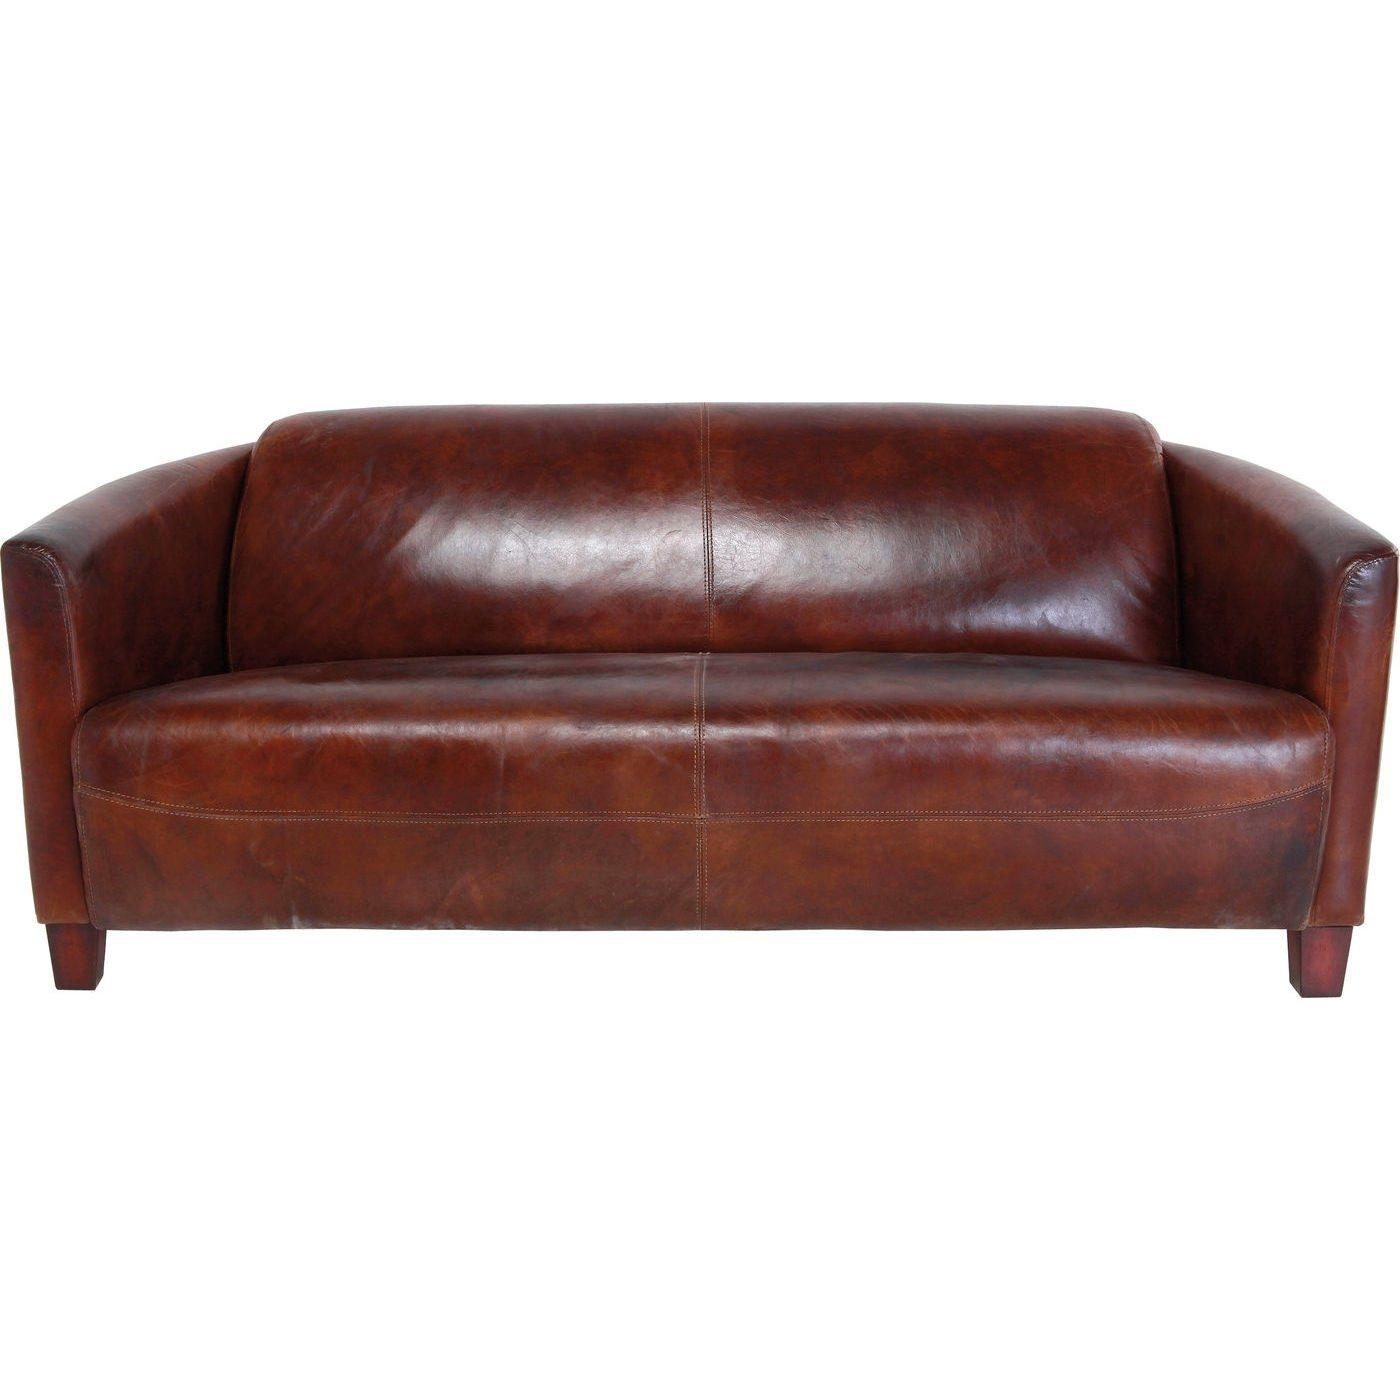 KARE Sofa »CIGARLOUNGE«, Material Leder online kaufen   OTTO